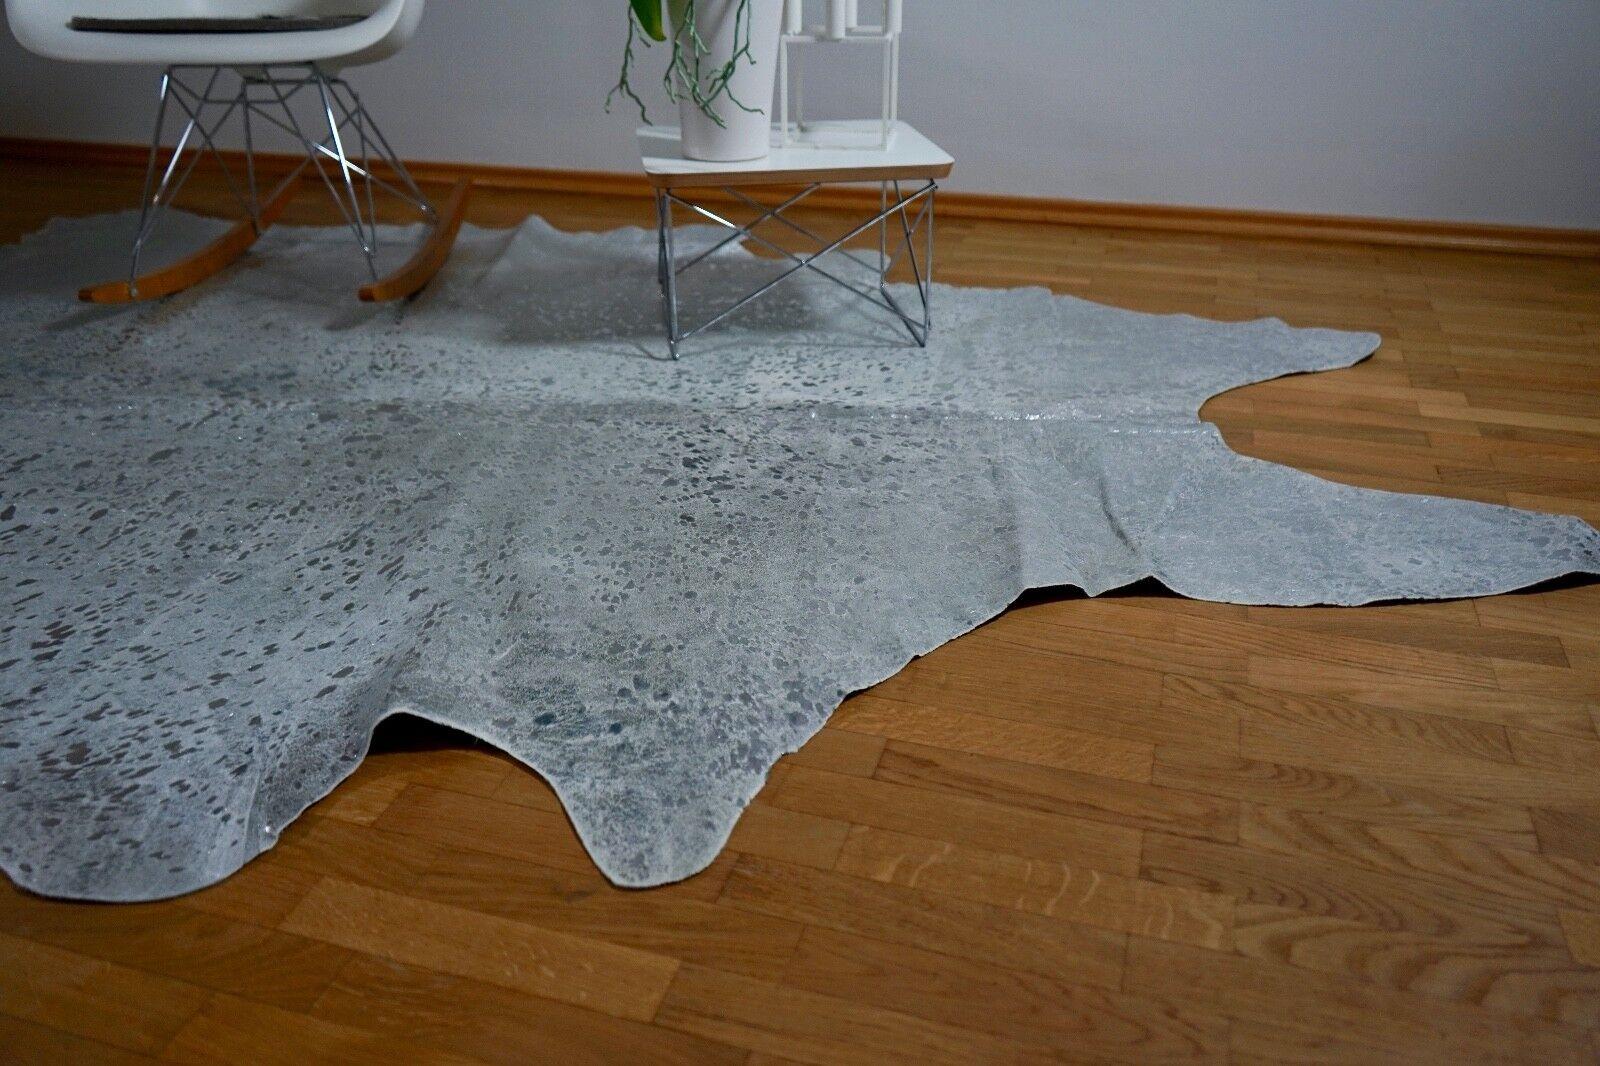 Peau rinderfell Metallic Metallic rinderfell gris clair argent-environ 220 cm x 207 cm, Neuf, rug 53dc7b